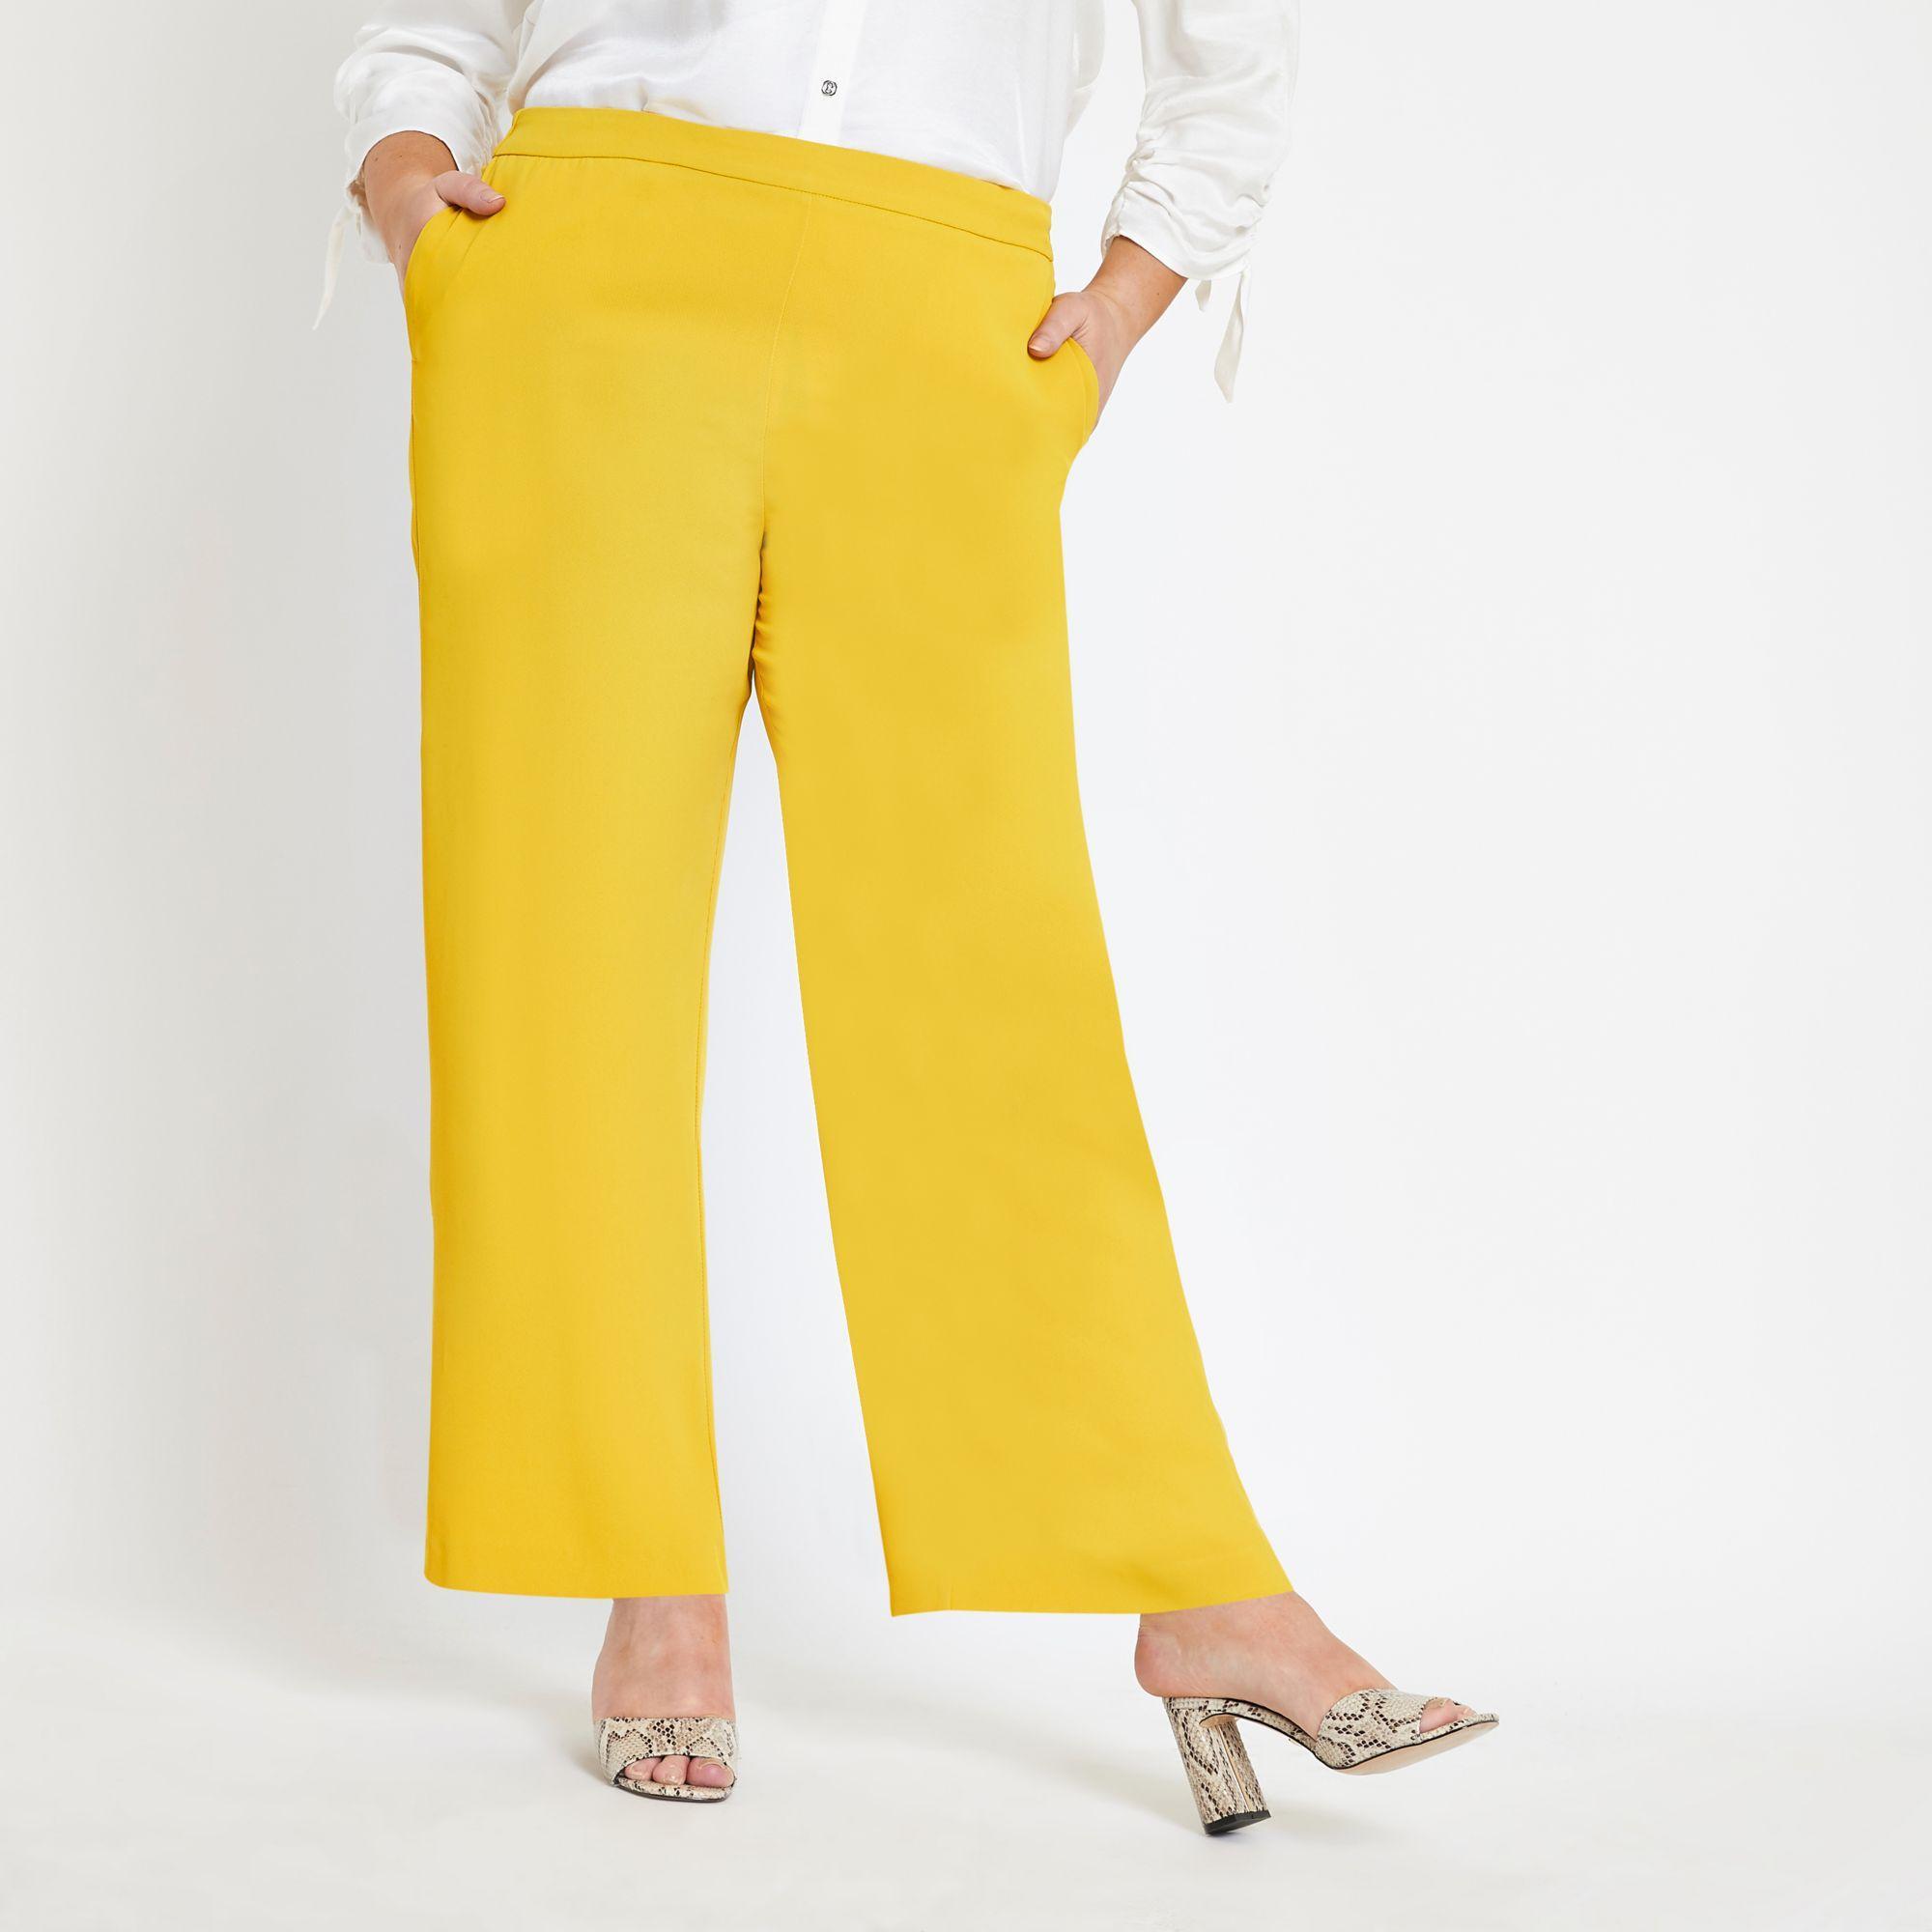 b9438a92d107 River Island - Plus Yellow Wide Leg Pants - Lyst. View fullscreen